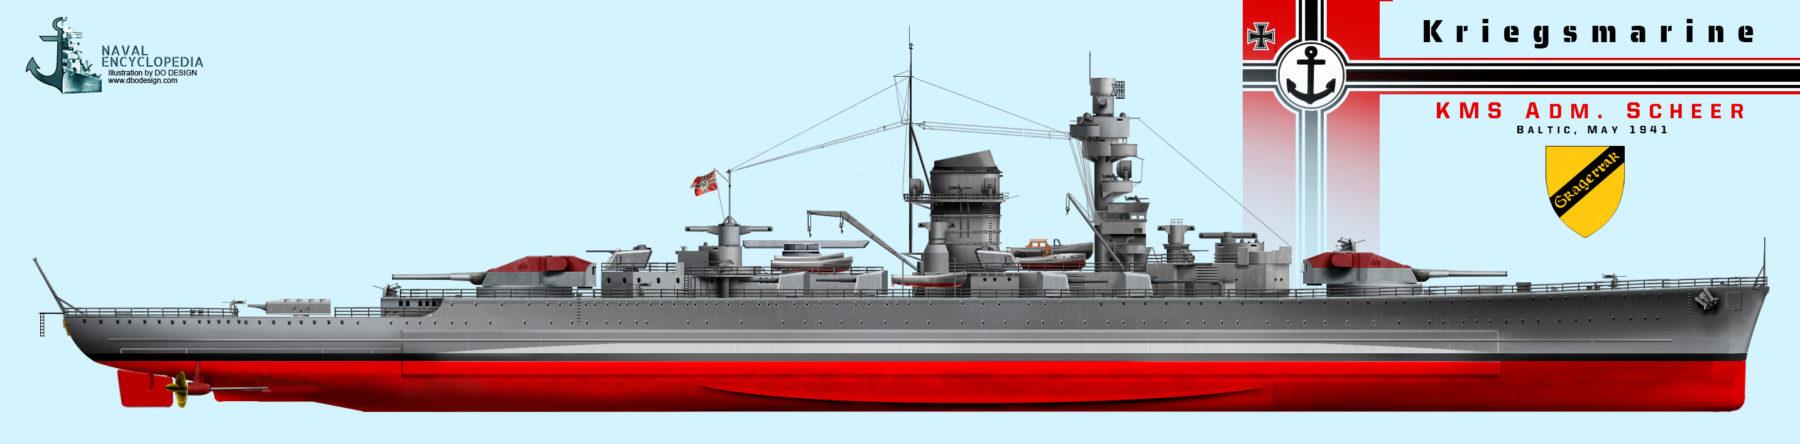 KMS Admiral Scheer, May 1941